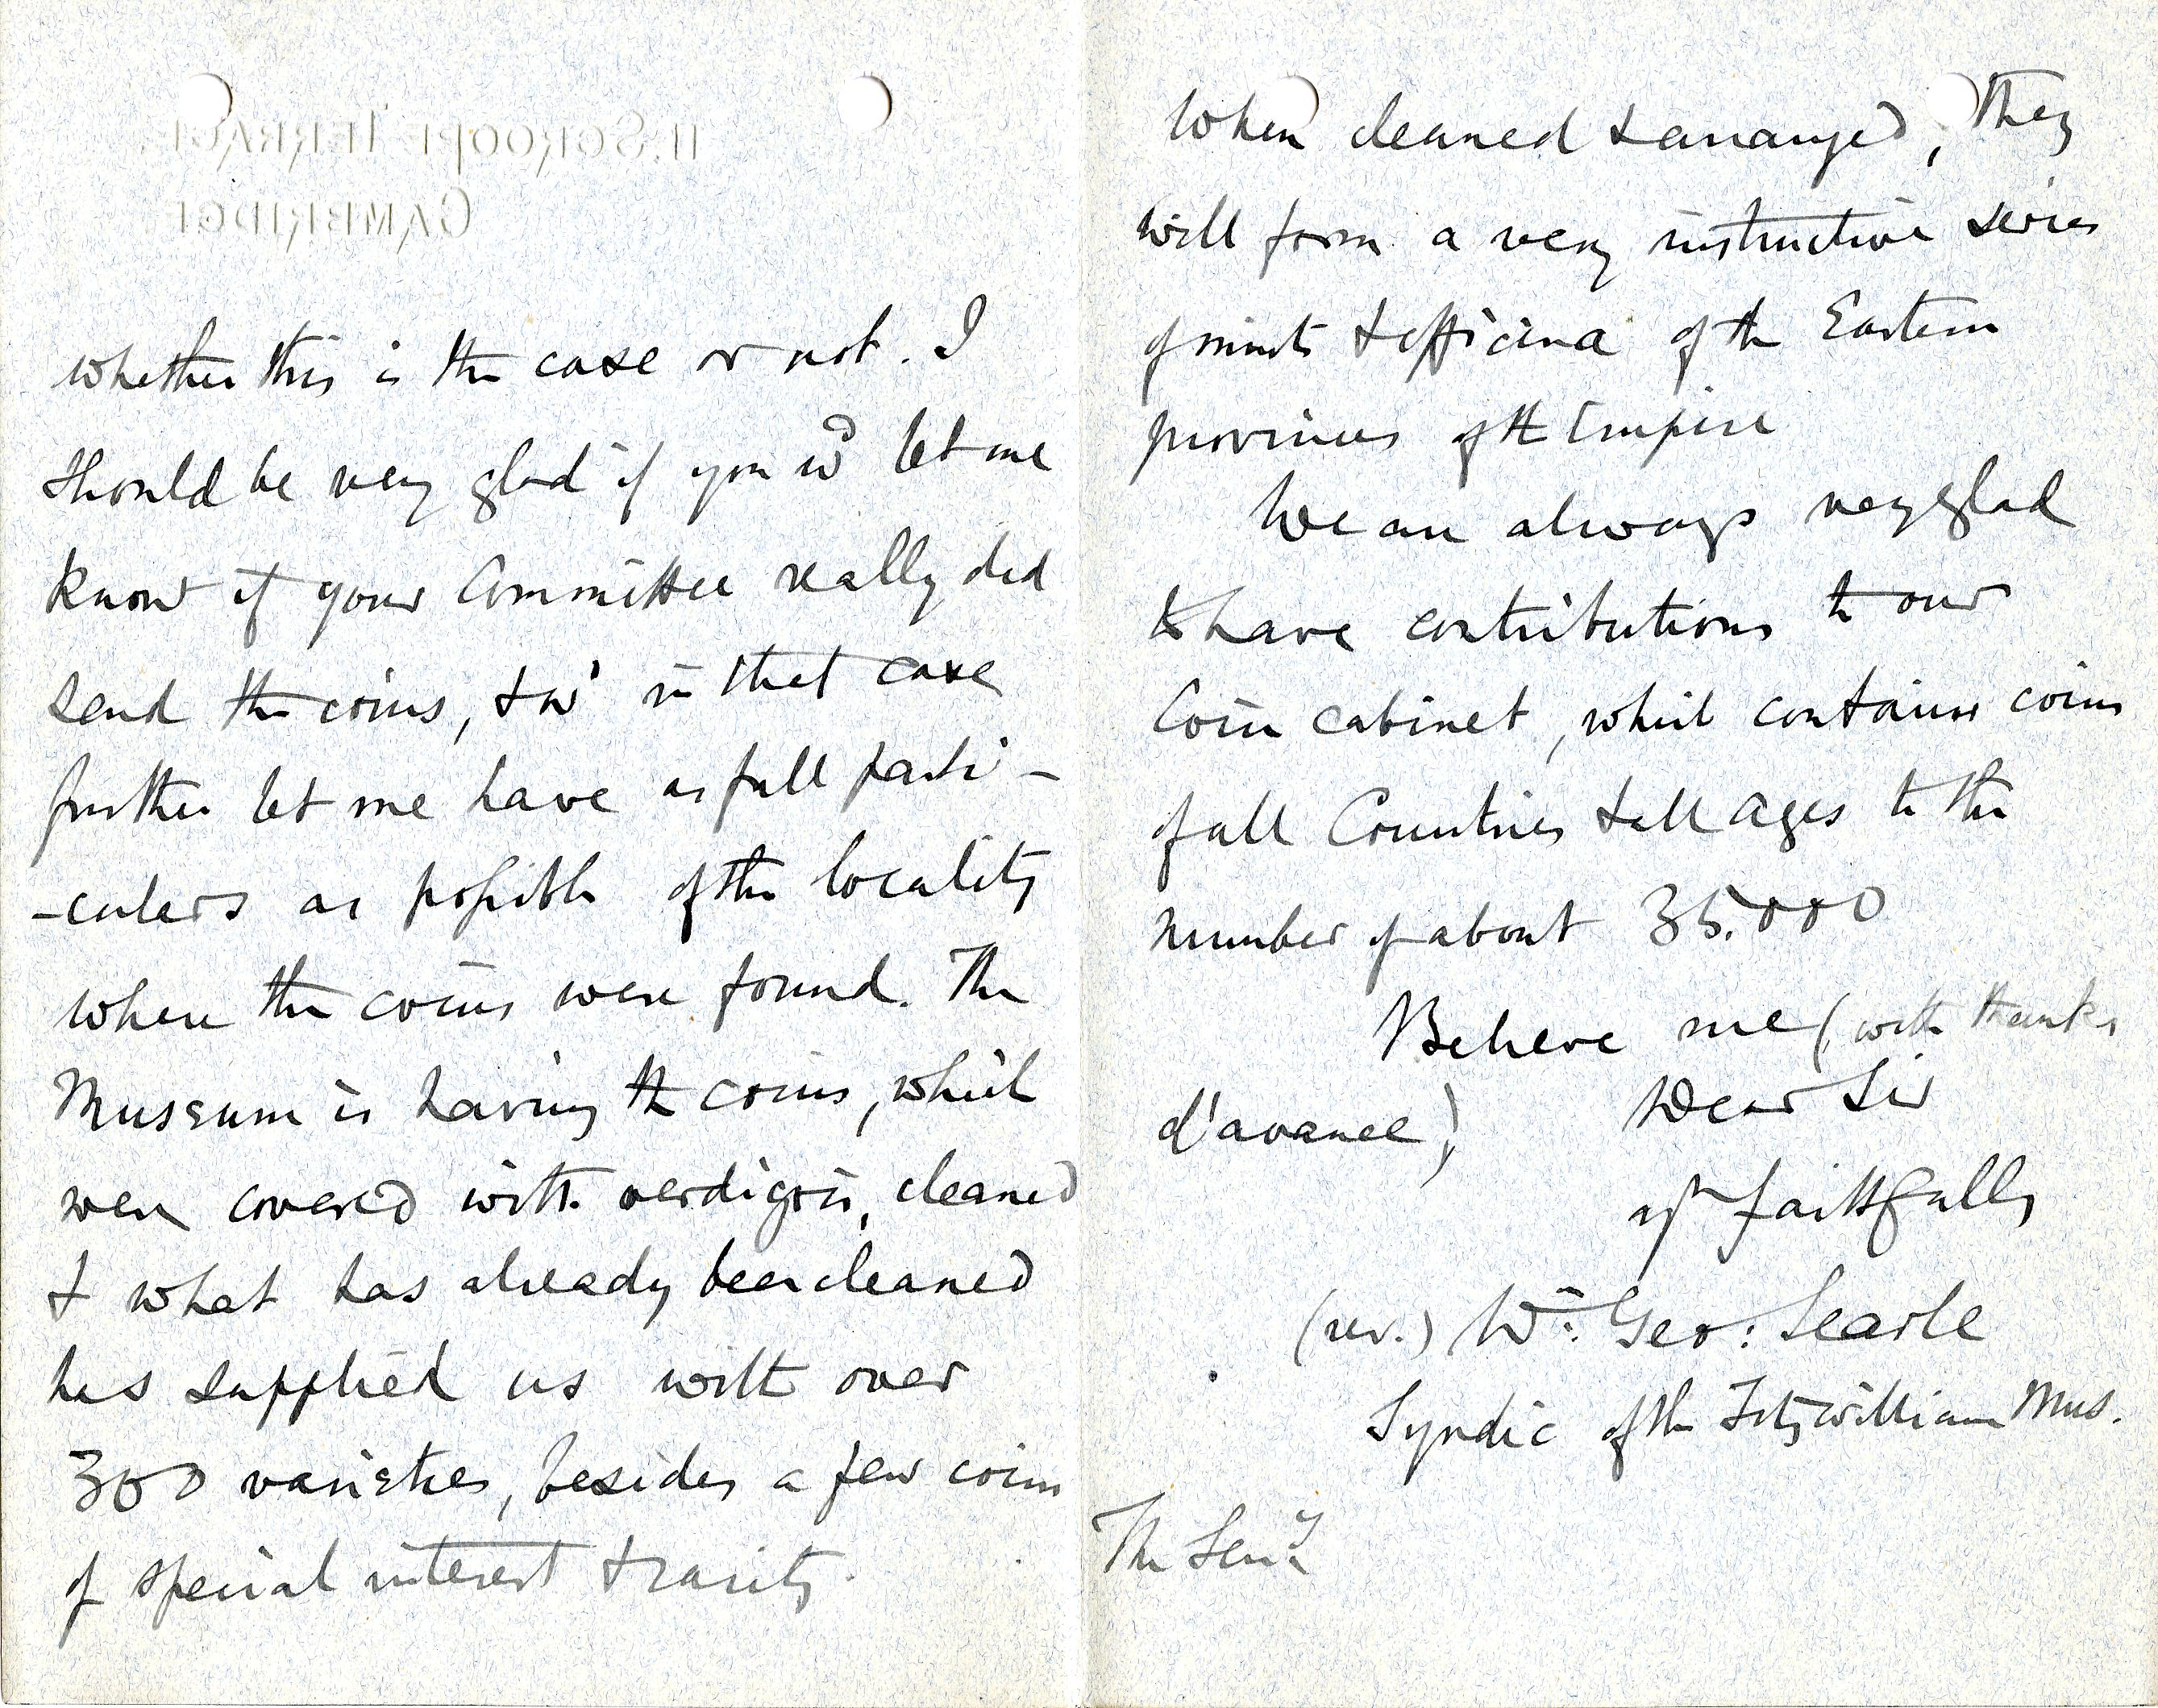 1904-05 Sinai, Deir el-Bahri, Oxyrhynchus, Naukratis DIST.23.28b